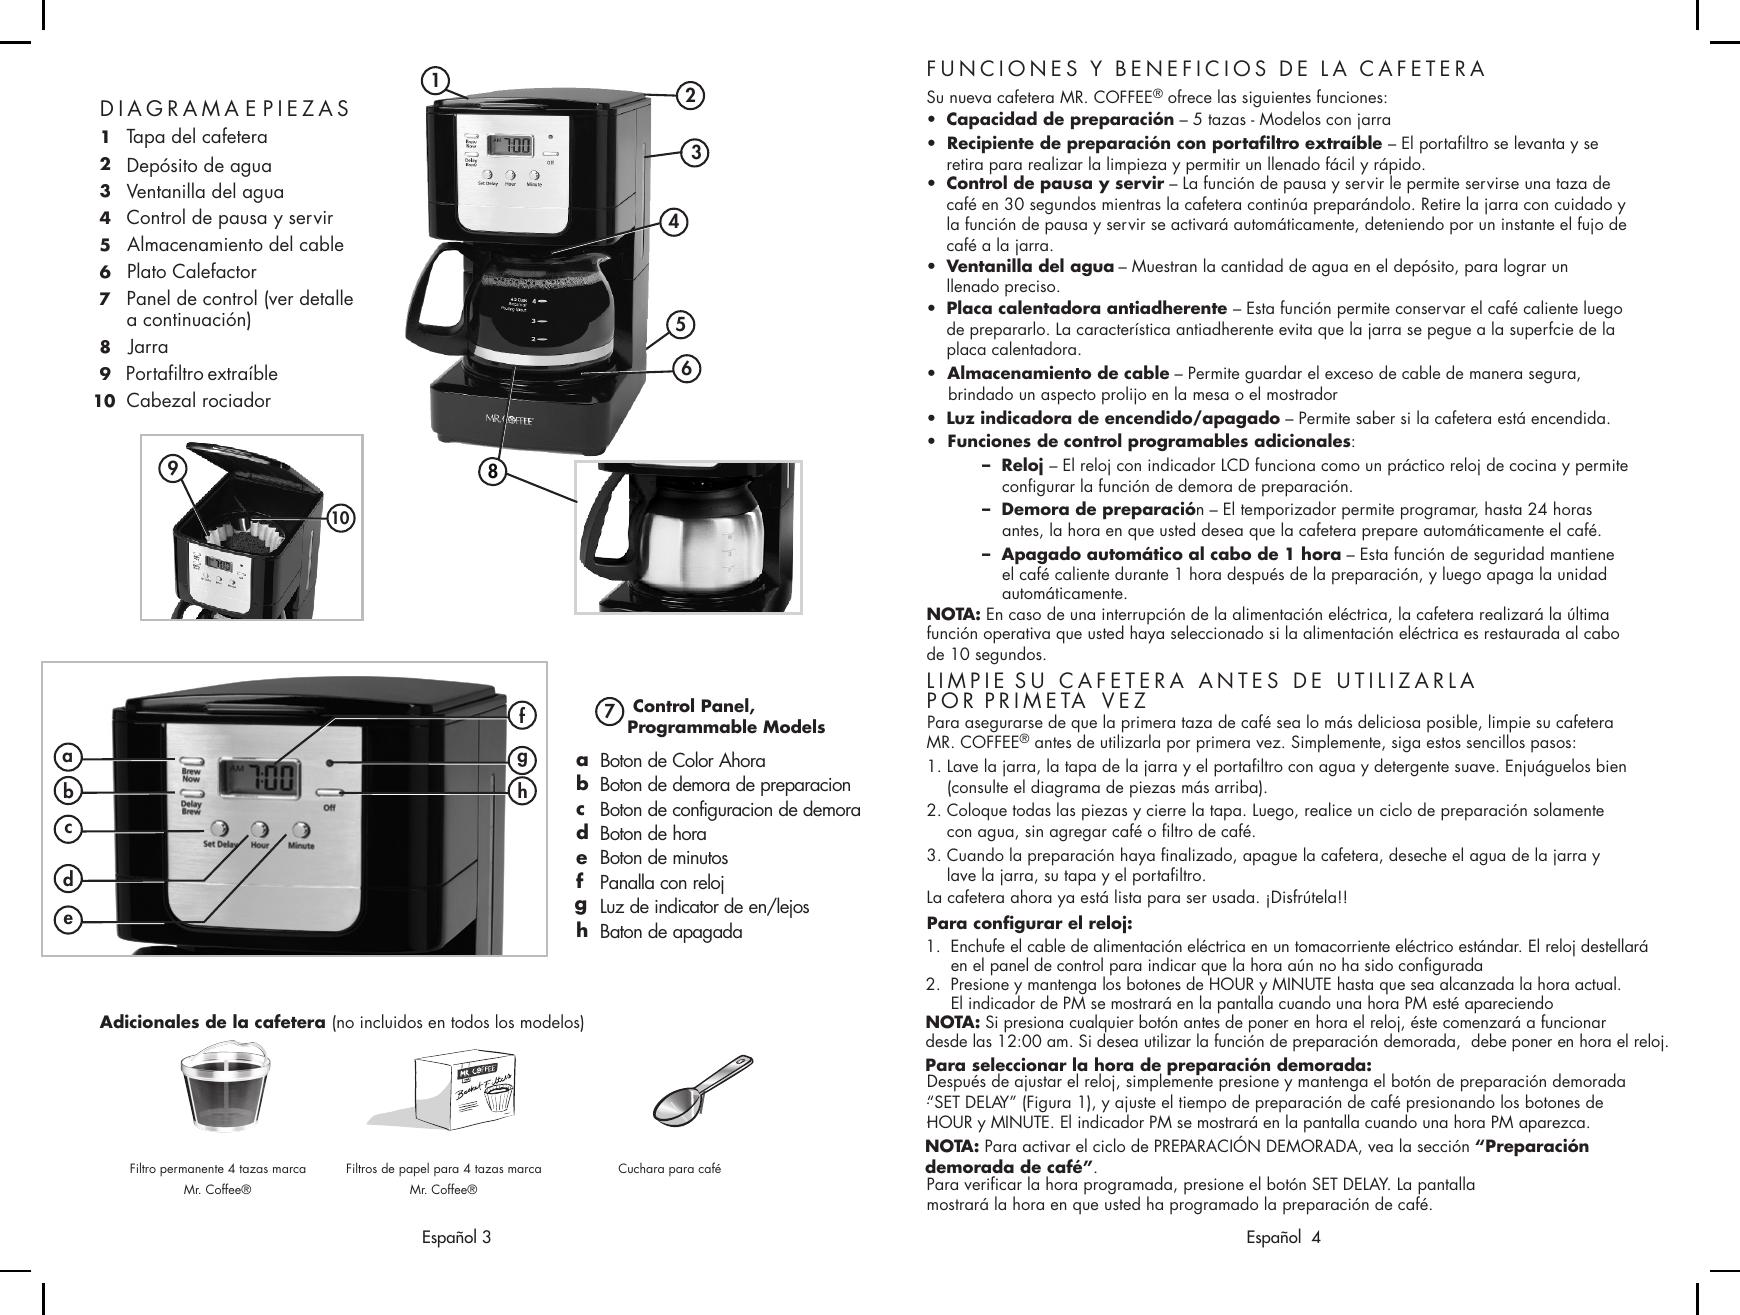 Mrcoffee Jwx3 Users Manual JWX 9 IB